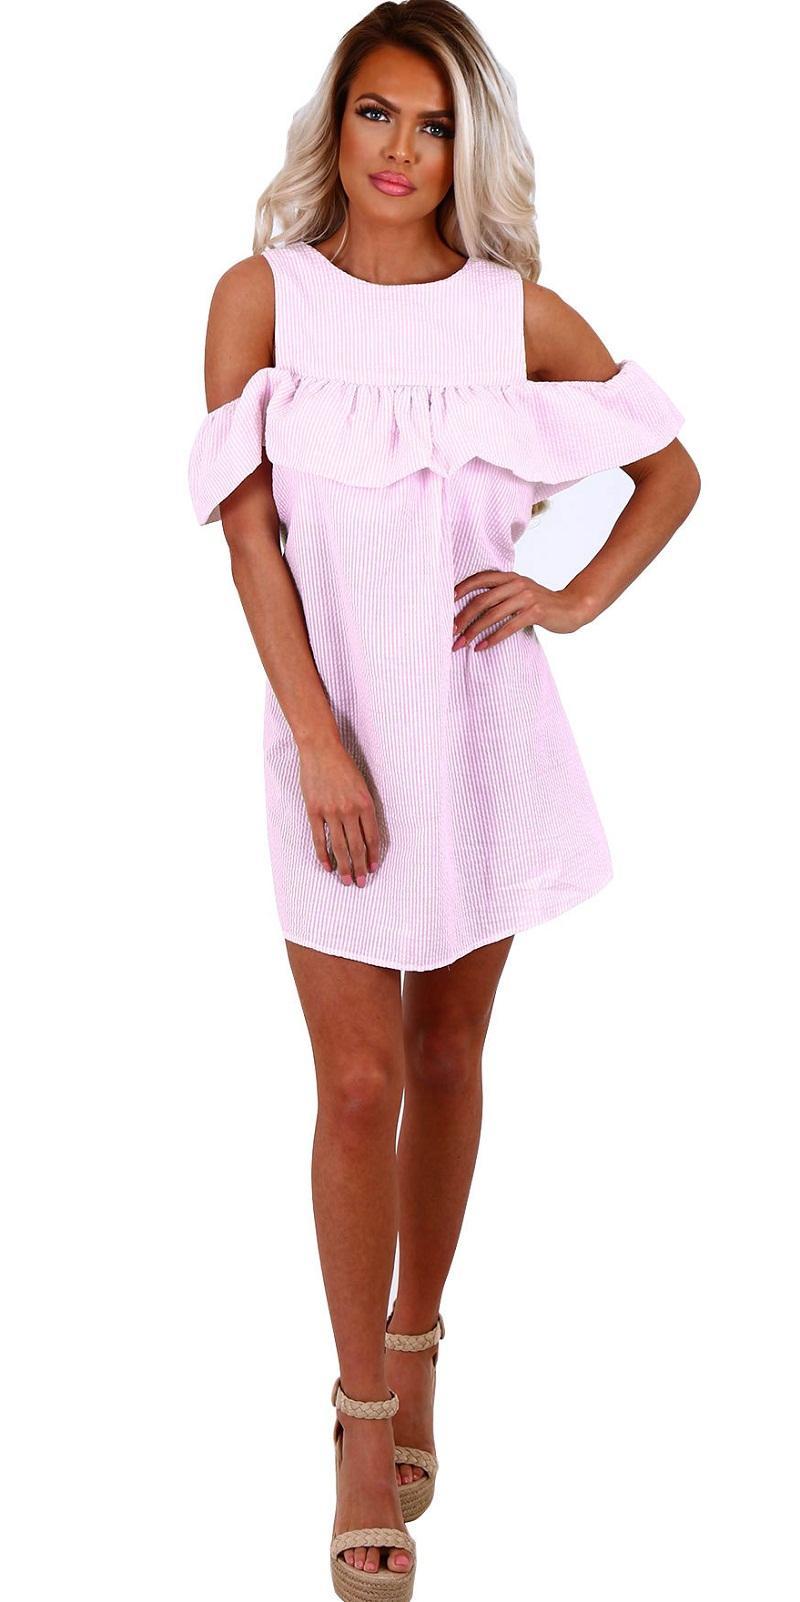 Fashion girls sexy & club dresses women striped skirts ruffled neck lady night dress short petal sleeve OL-8699